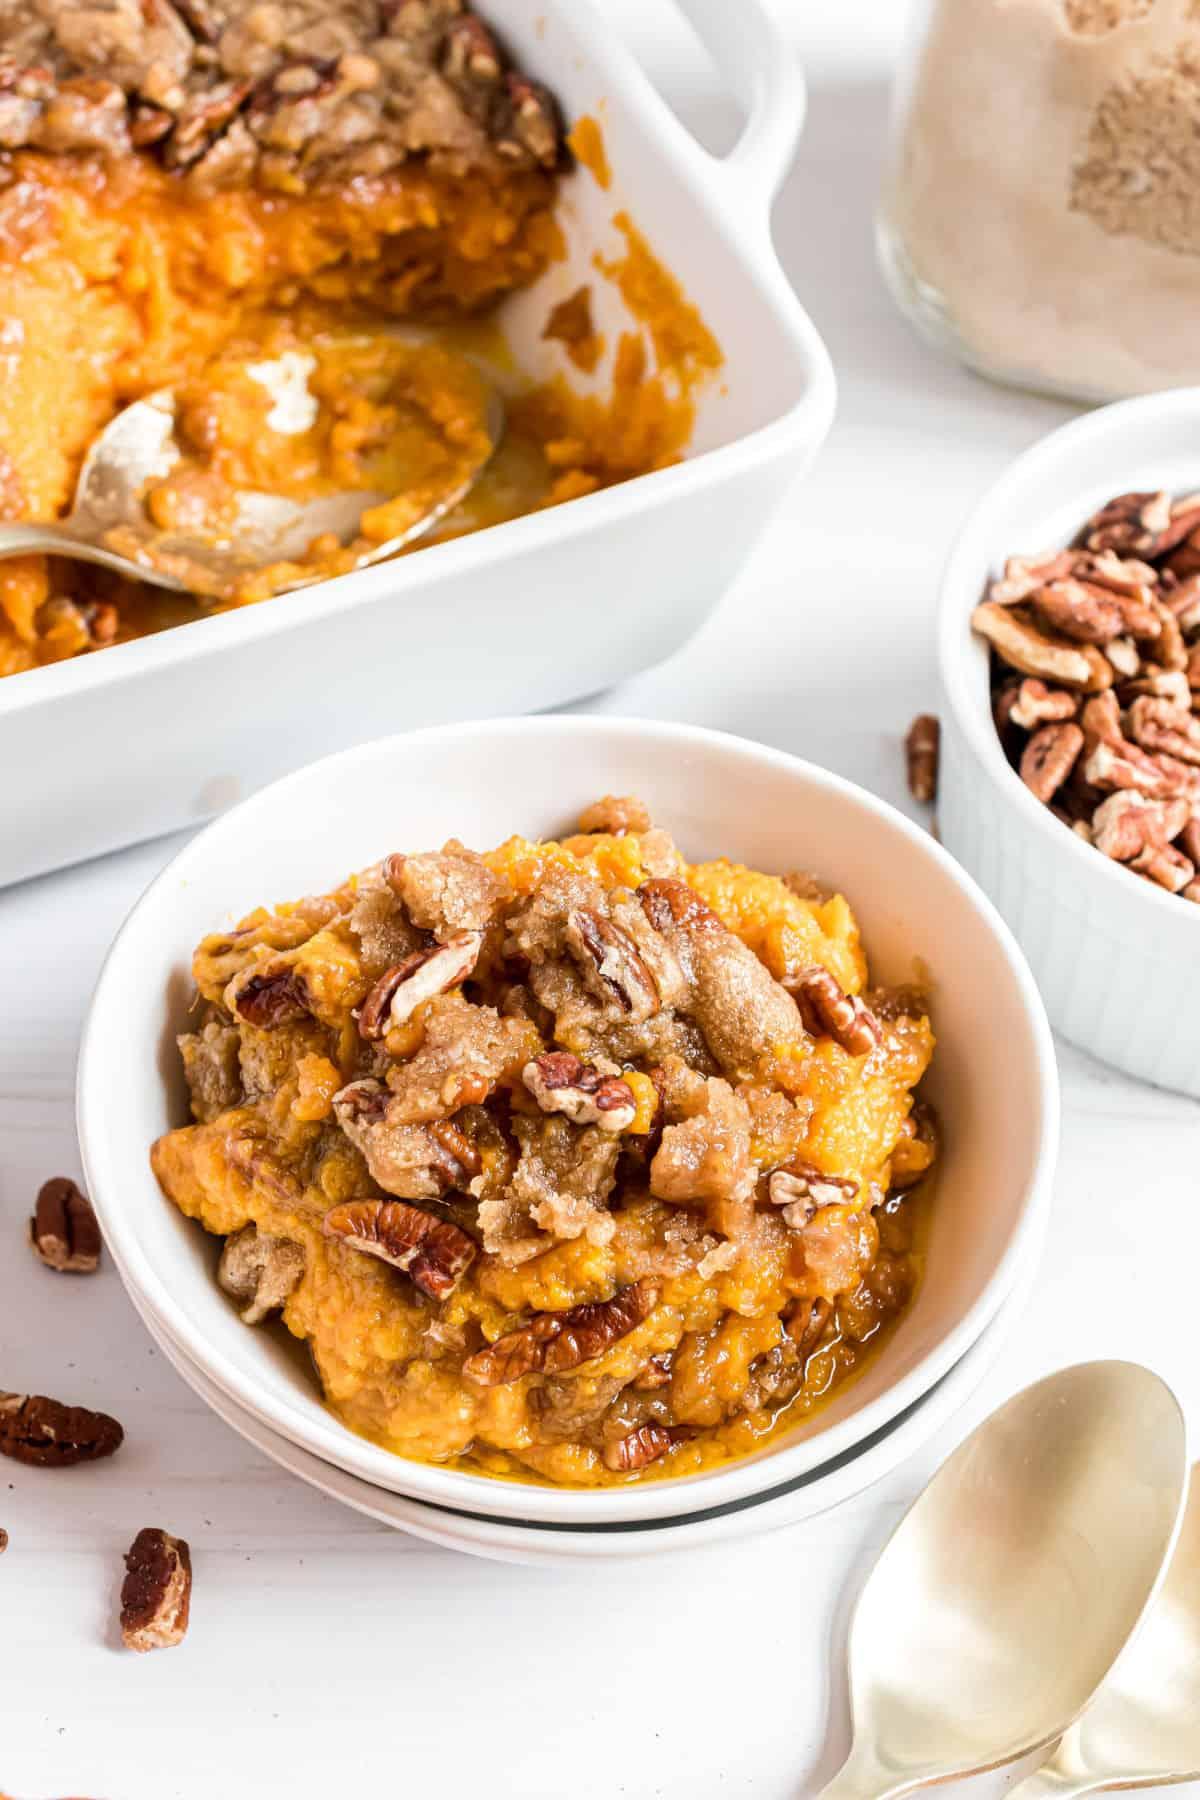 Sweet potato casserole recipe served in white bowls.